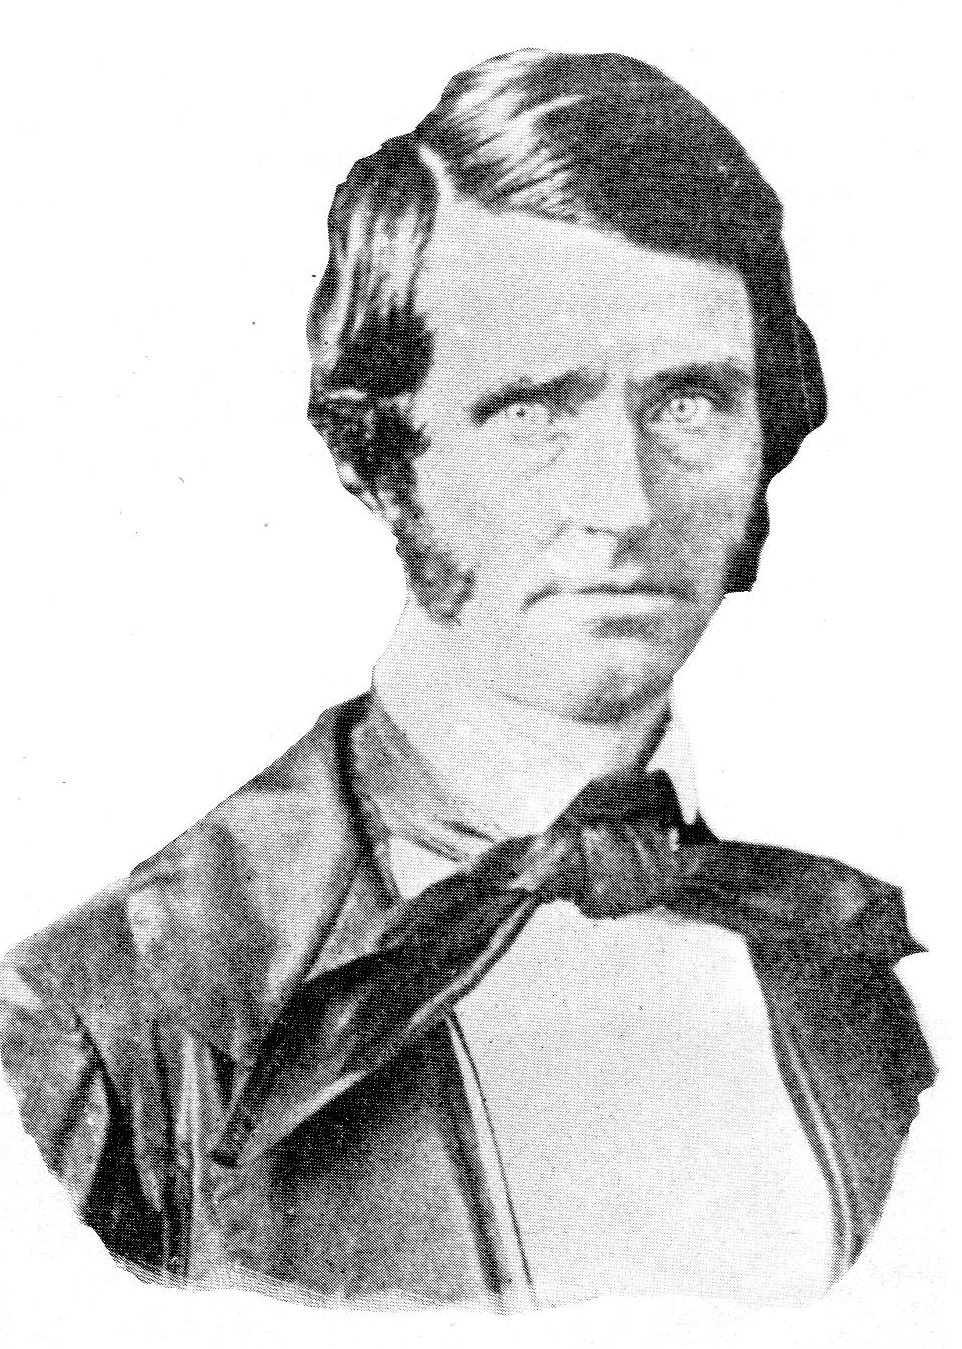 John Wesley Crockett